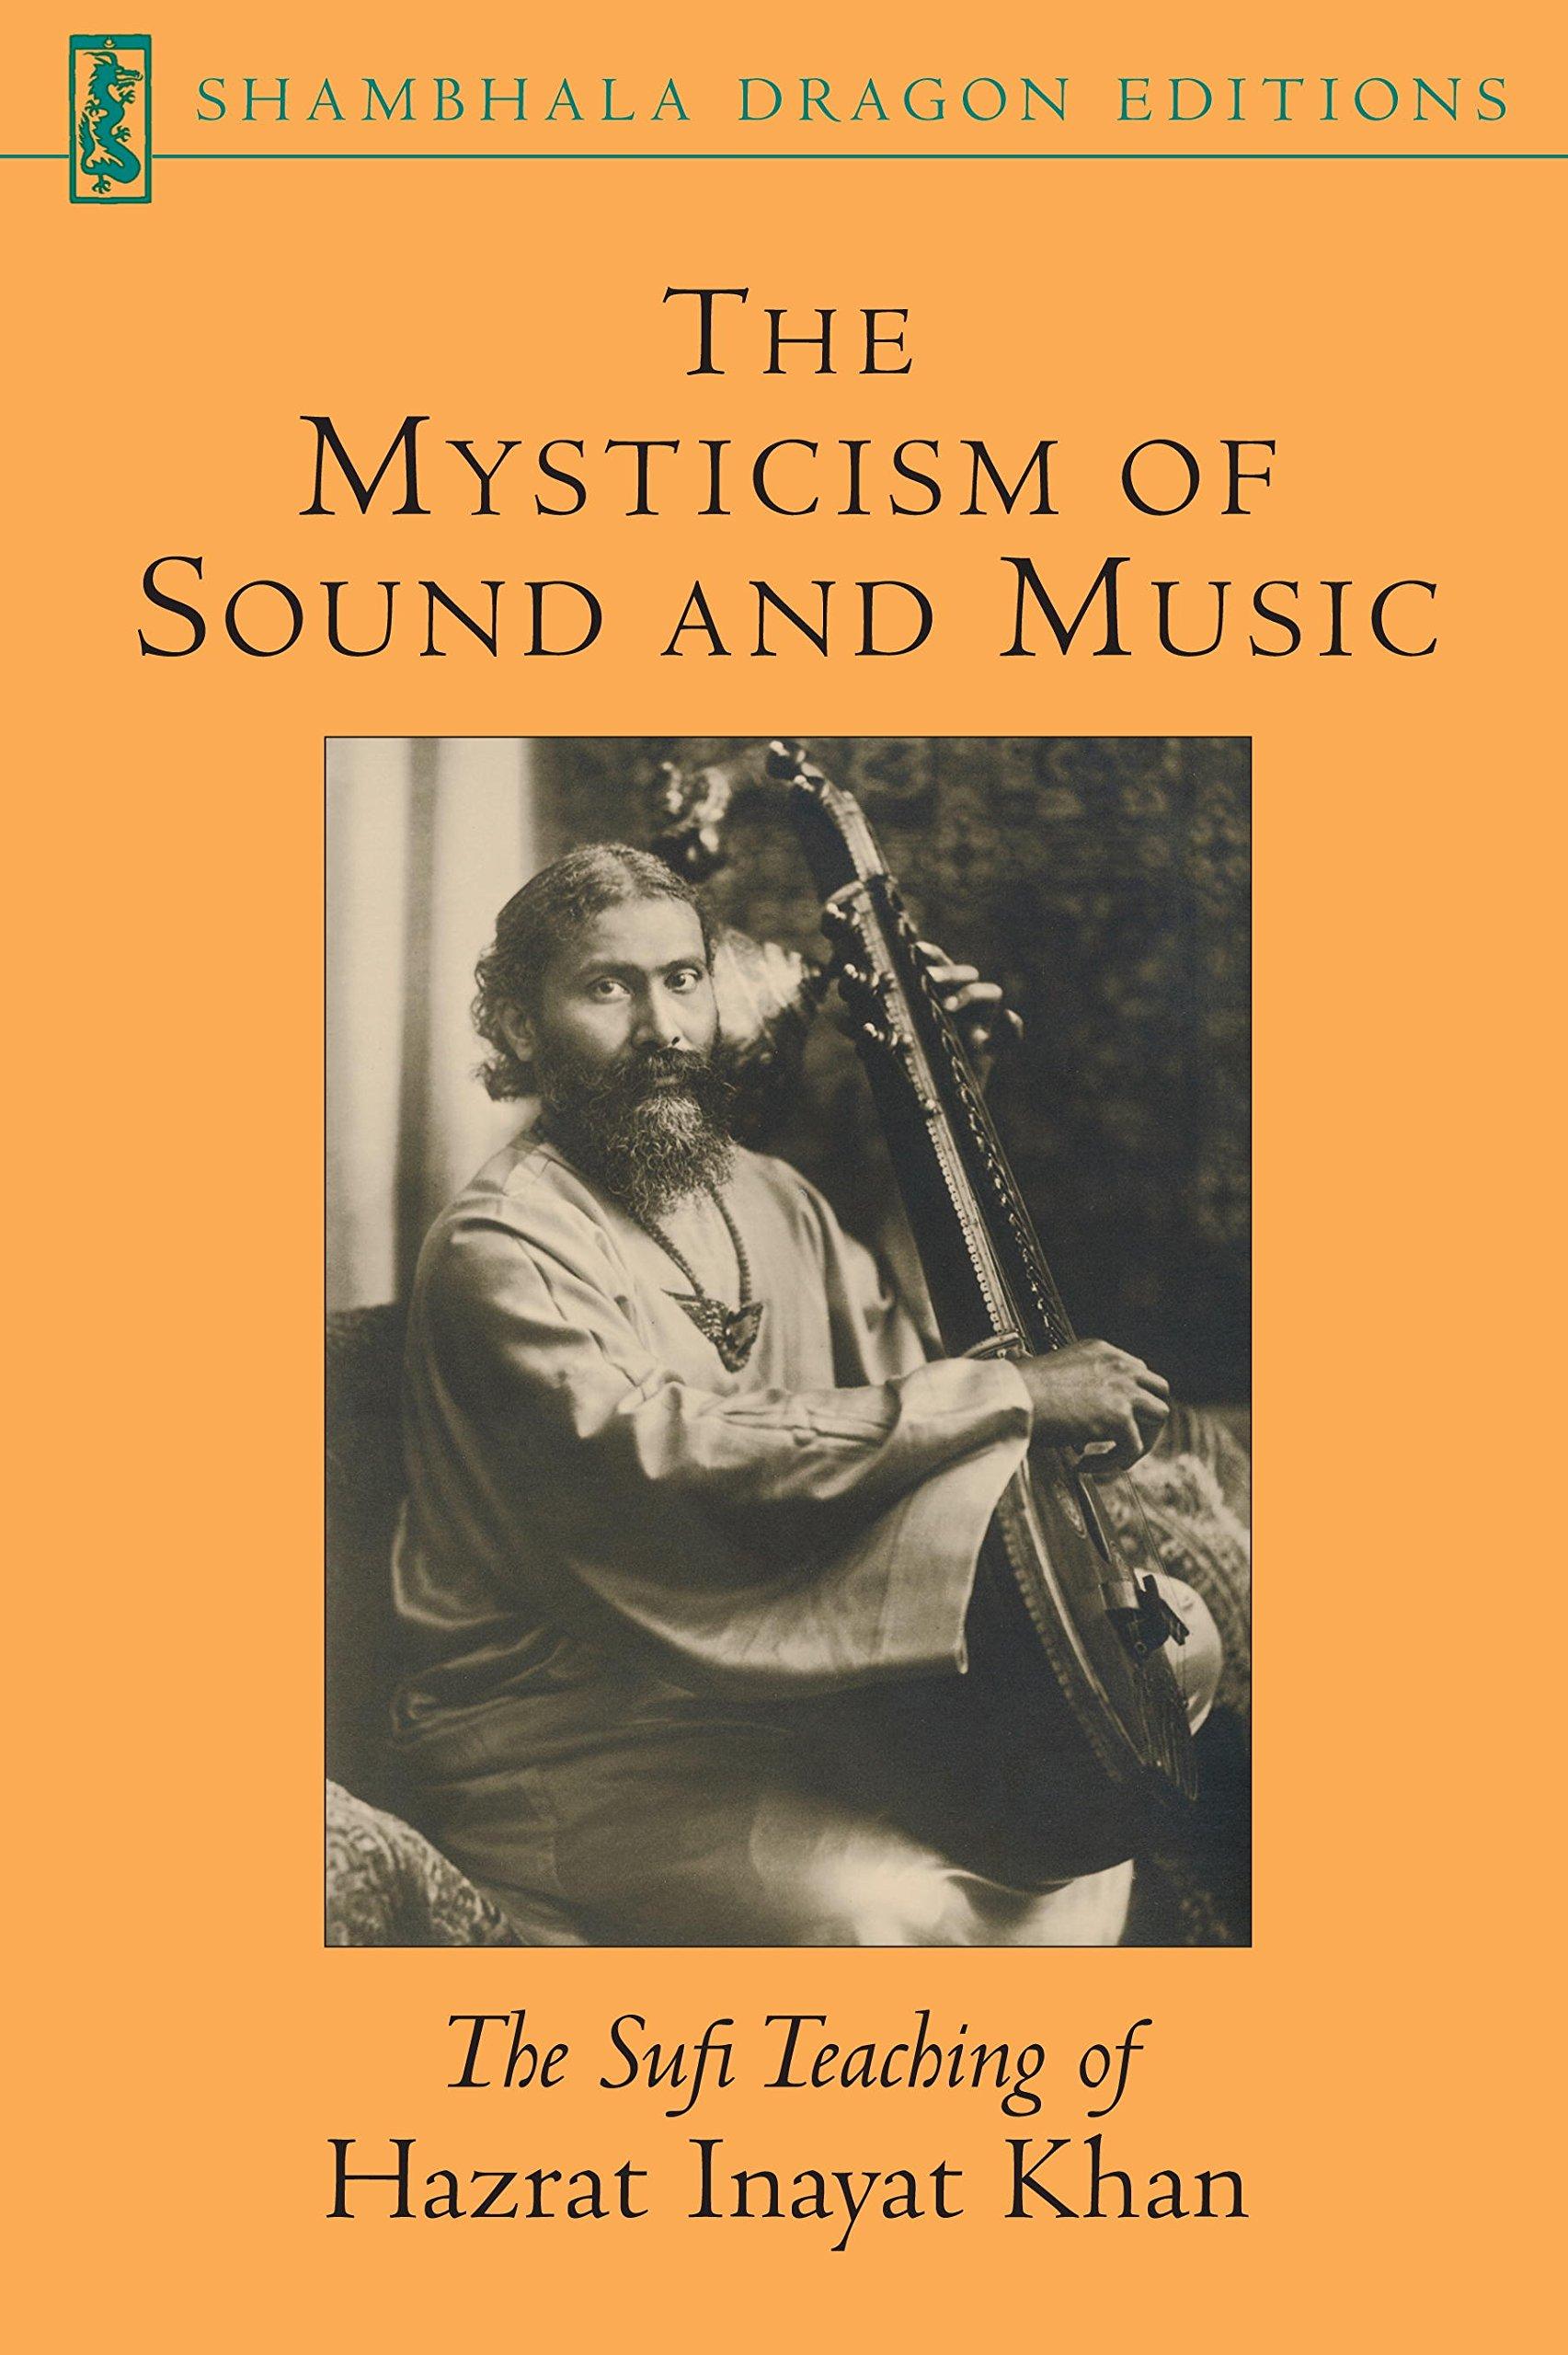 The Mysticism of Sound and Music: The Sufi Teaching of Hazrat Inayat Khan (Shambhala Dragon Editions)